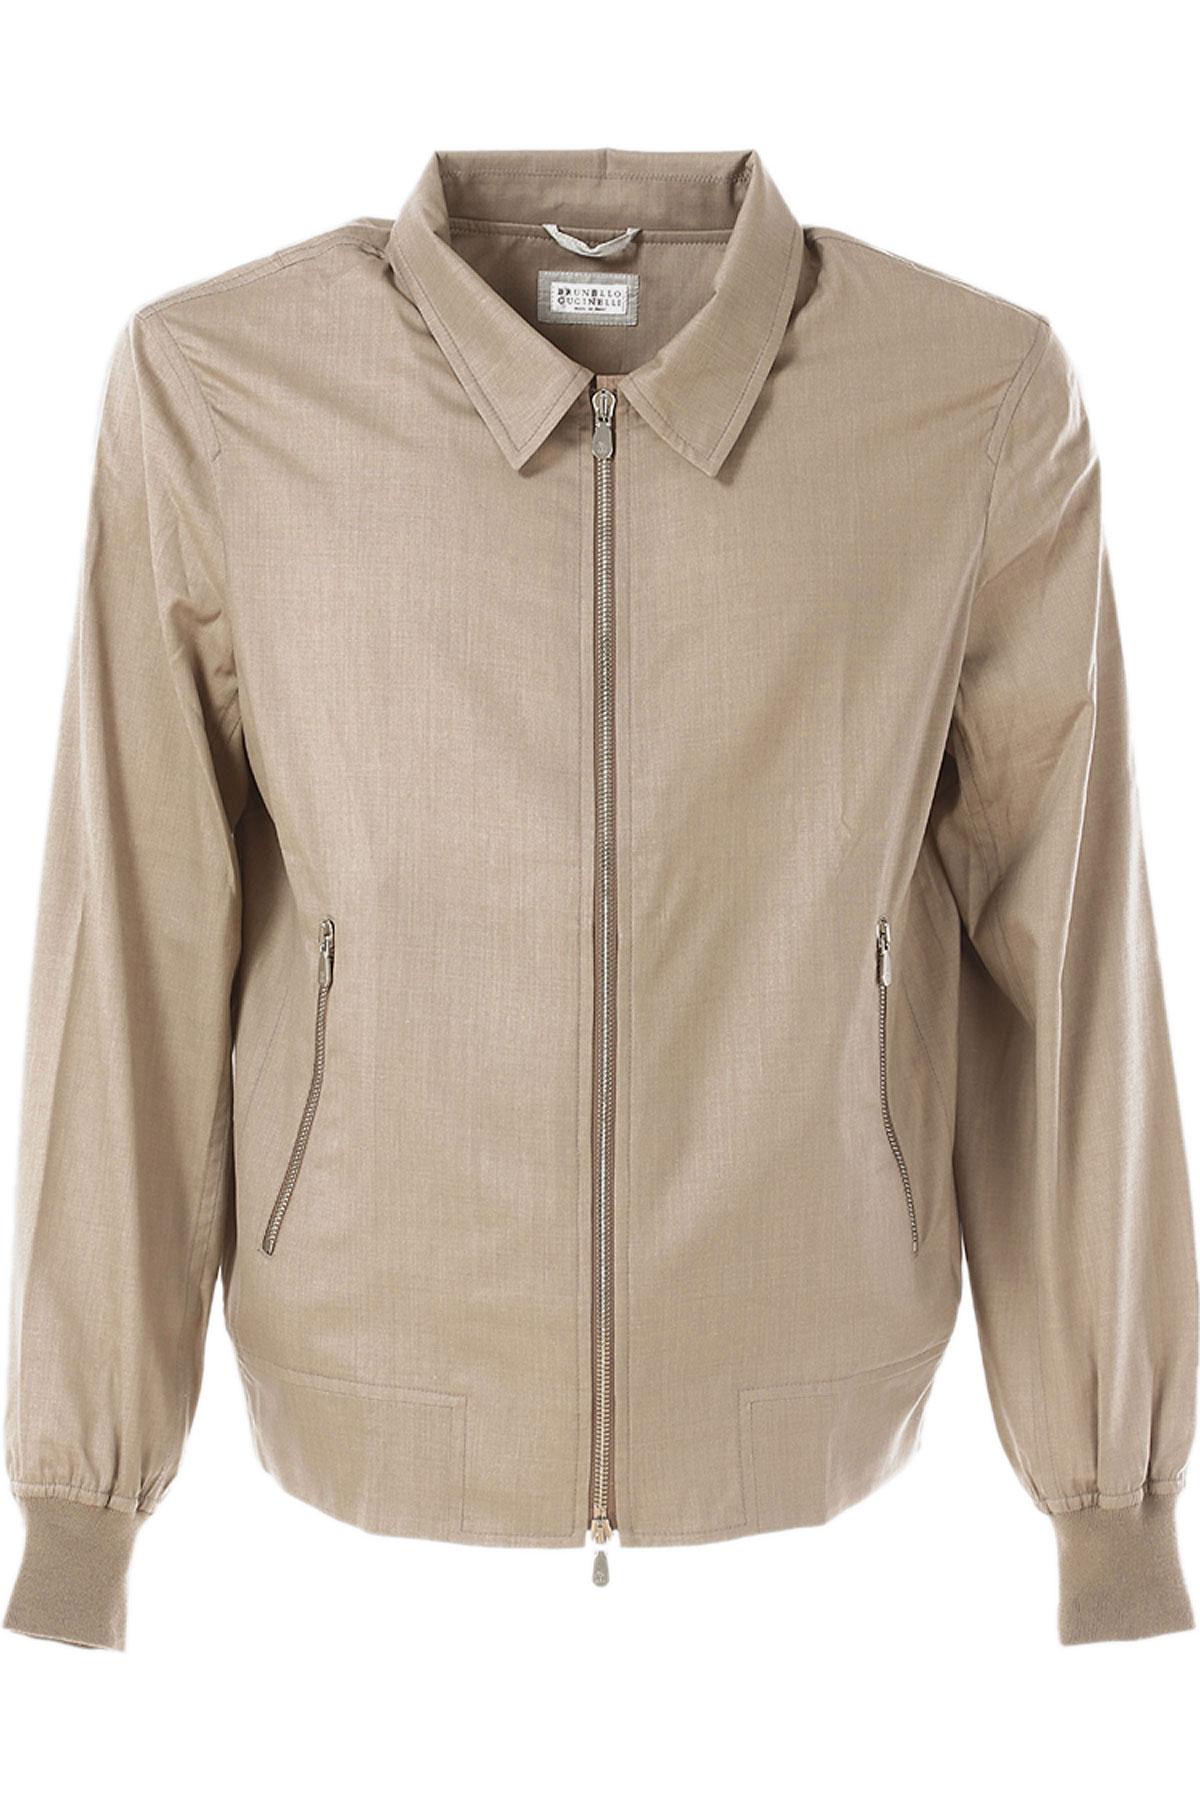 Image of Brunello Cucinelli Jacket for Men On Sale in Outlet, Dark Rope, Virgin wool, 2017, L M